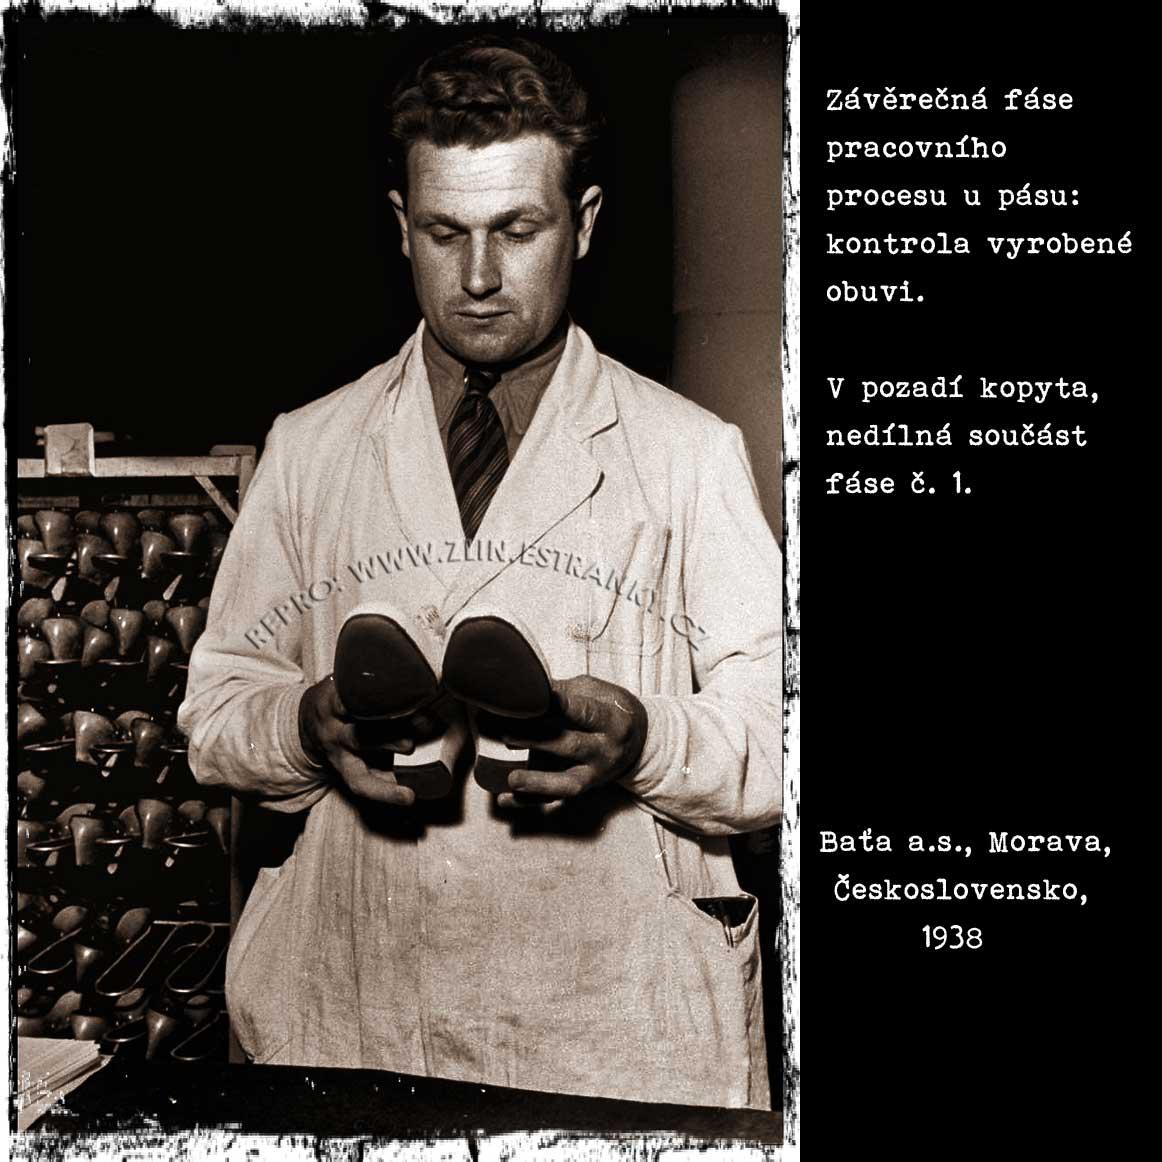 Baťa a.s. - kontrola vyrobené obuvi (1938)